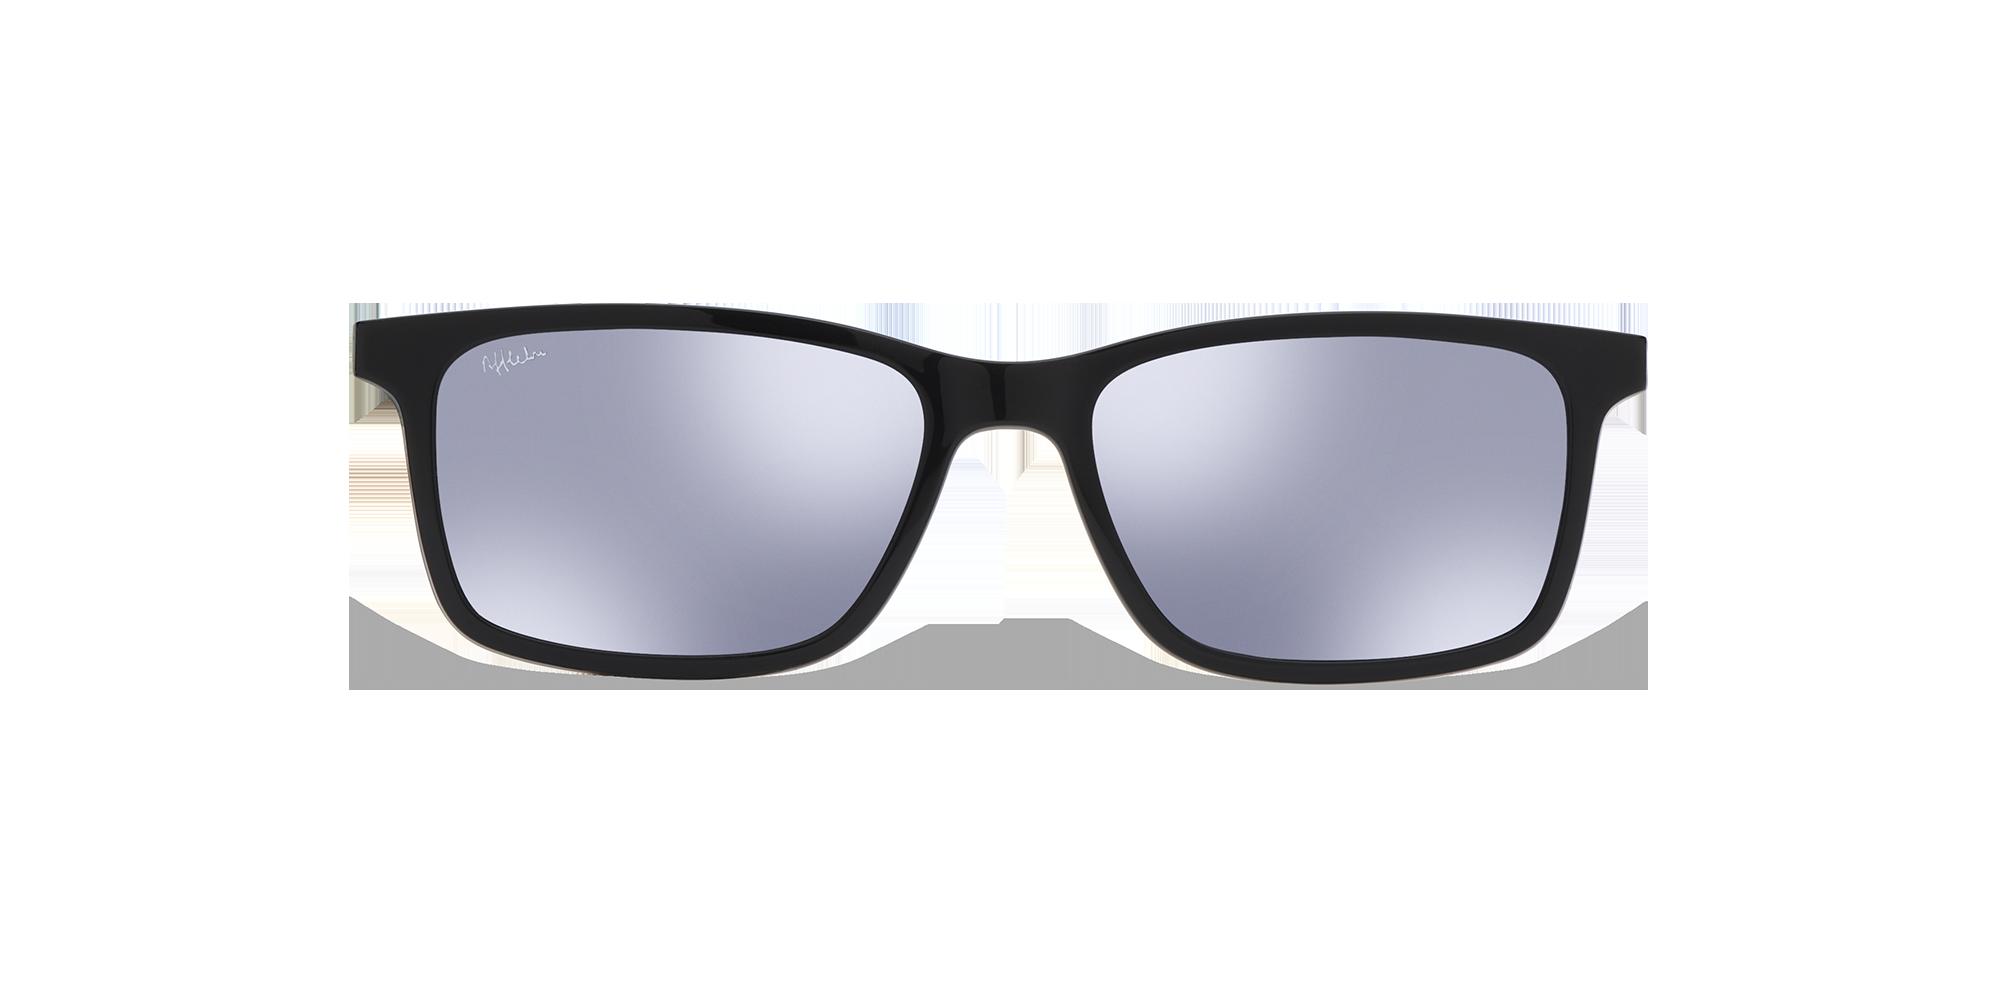 afflelou/france/products/smart_clip/clips_glasses/TMK32S4BK015316.png